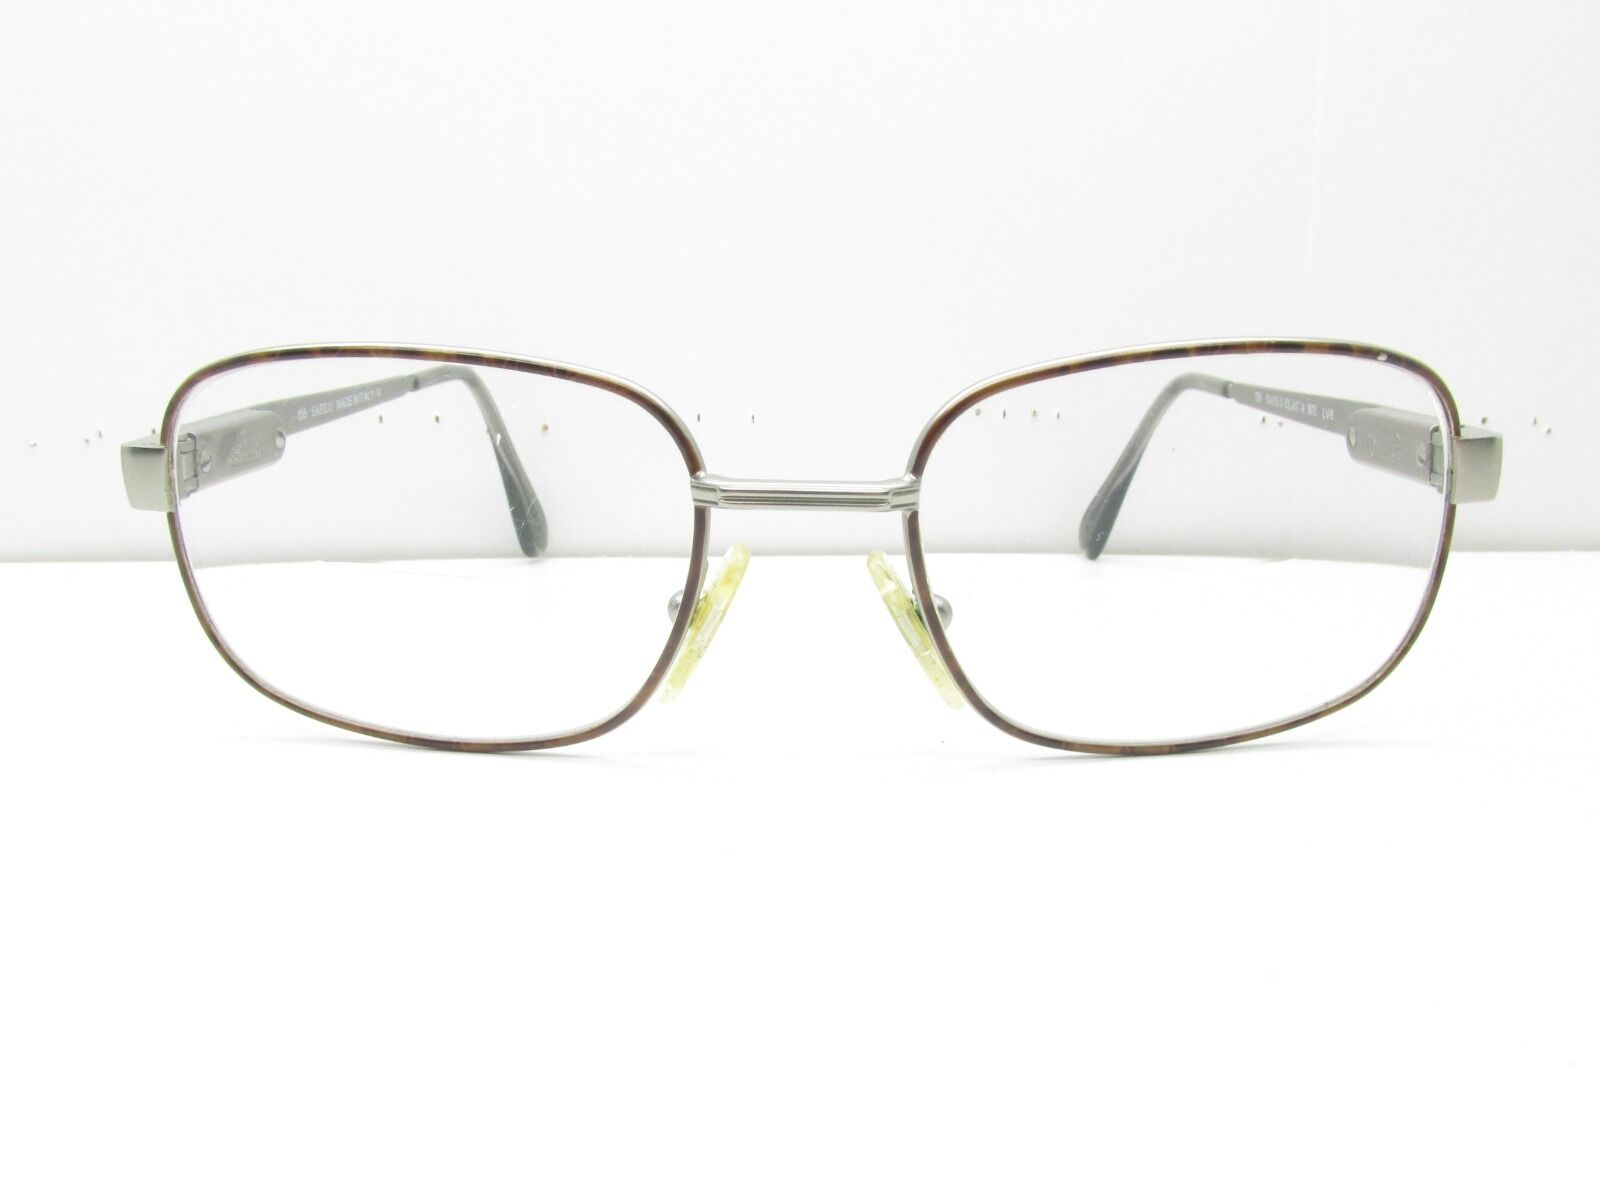 Safilo Elasta 3071 Eyewear Frames 53-18-135 Silver Tortoise ...